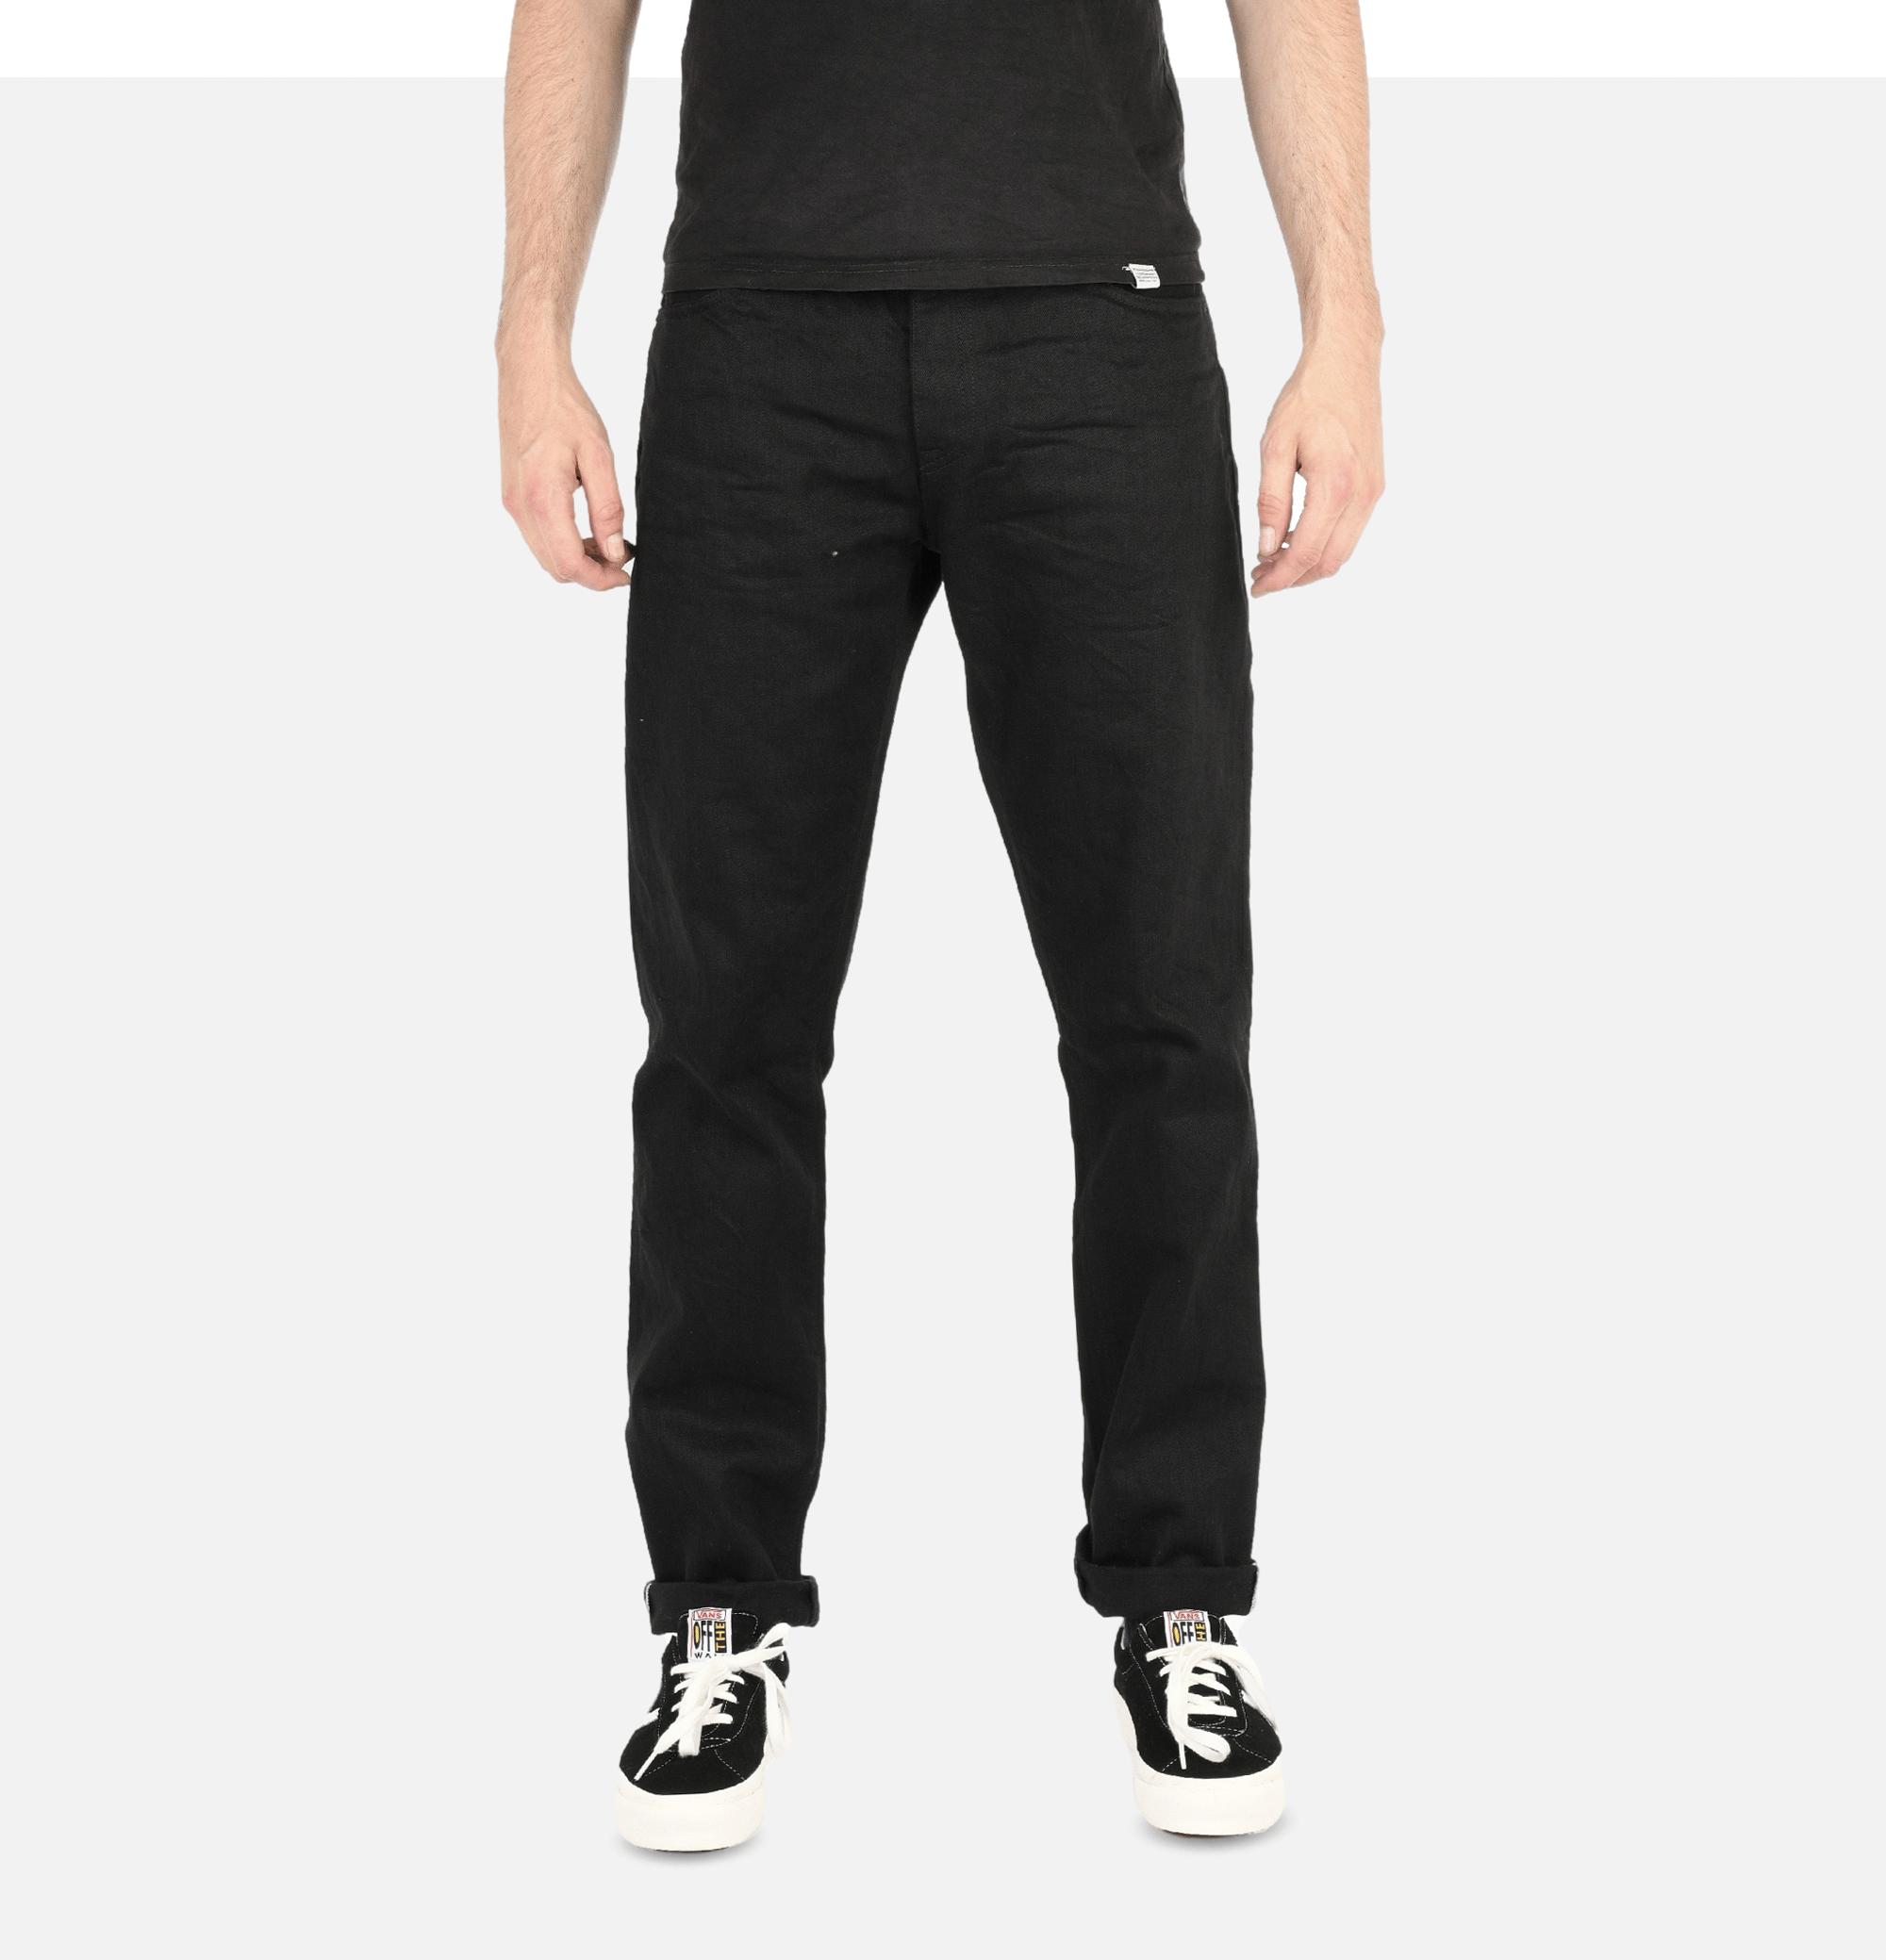 316 Jeans 14 Oz Black Selvedge